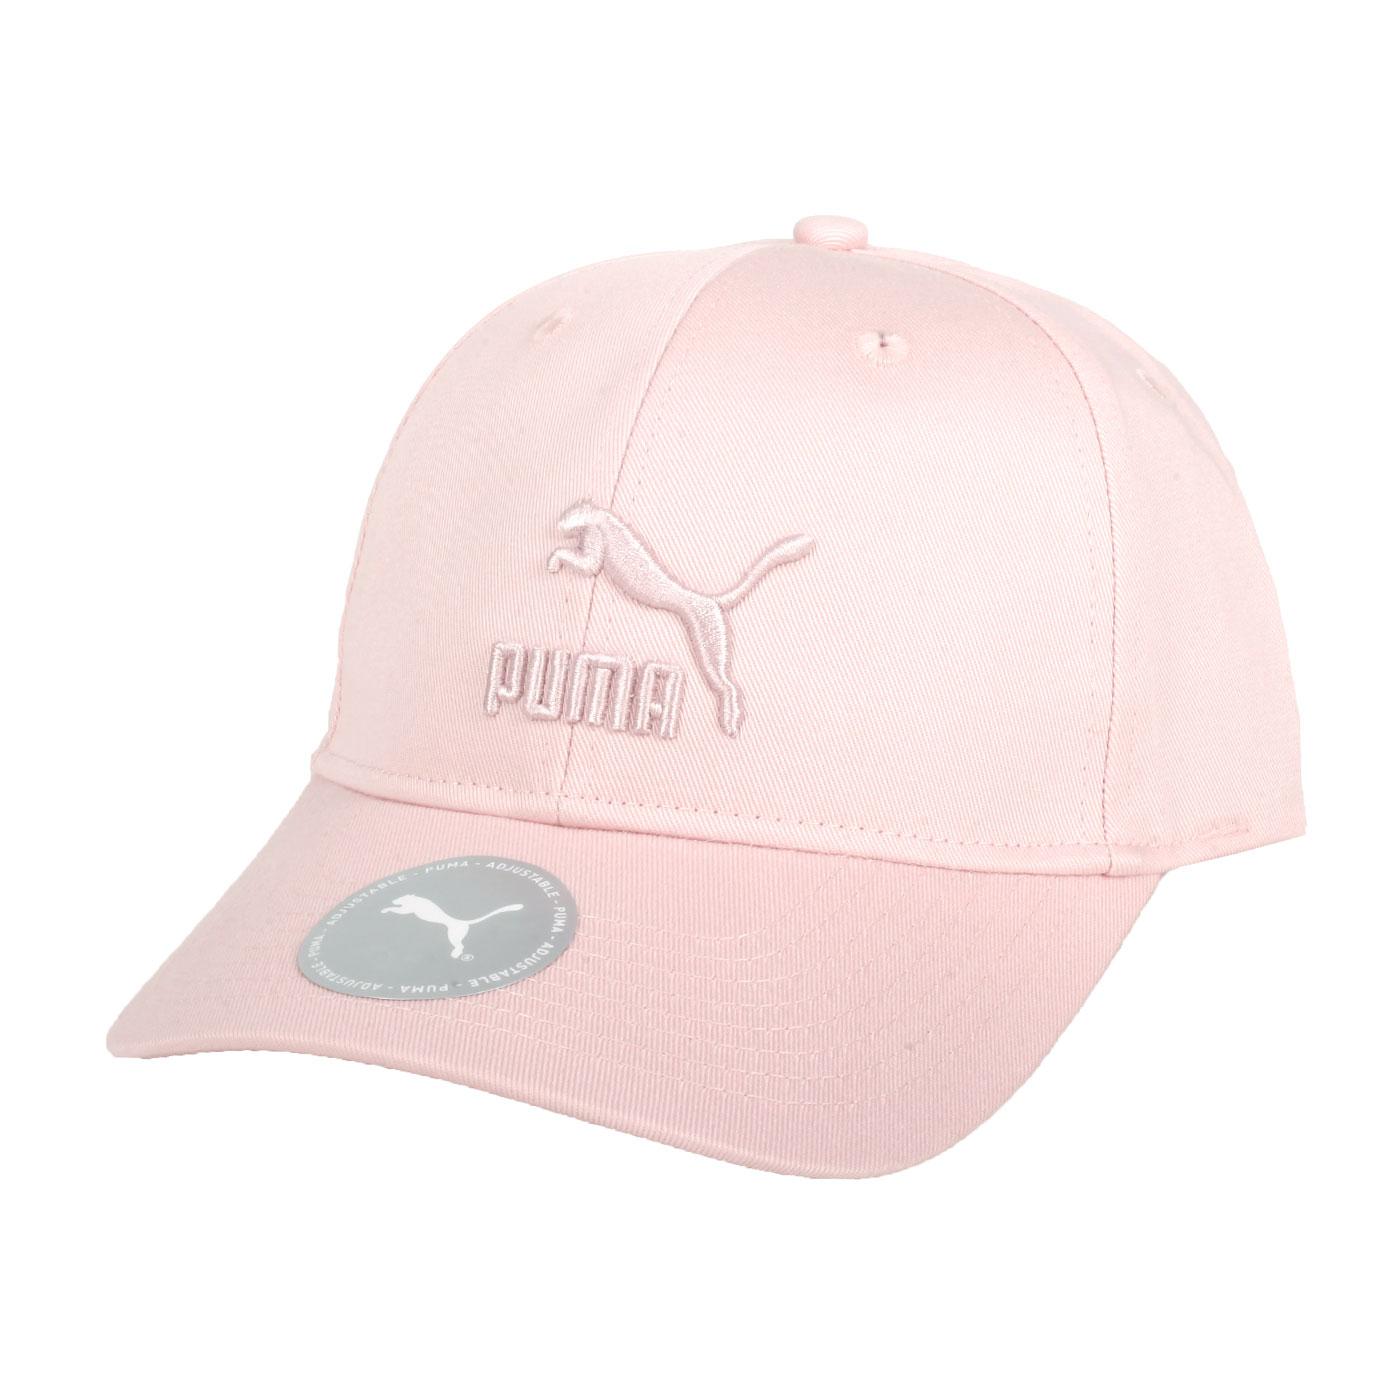 PUMA 流行系列棒球帽 02255414